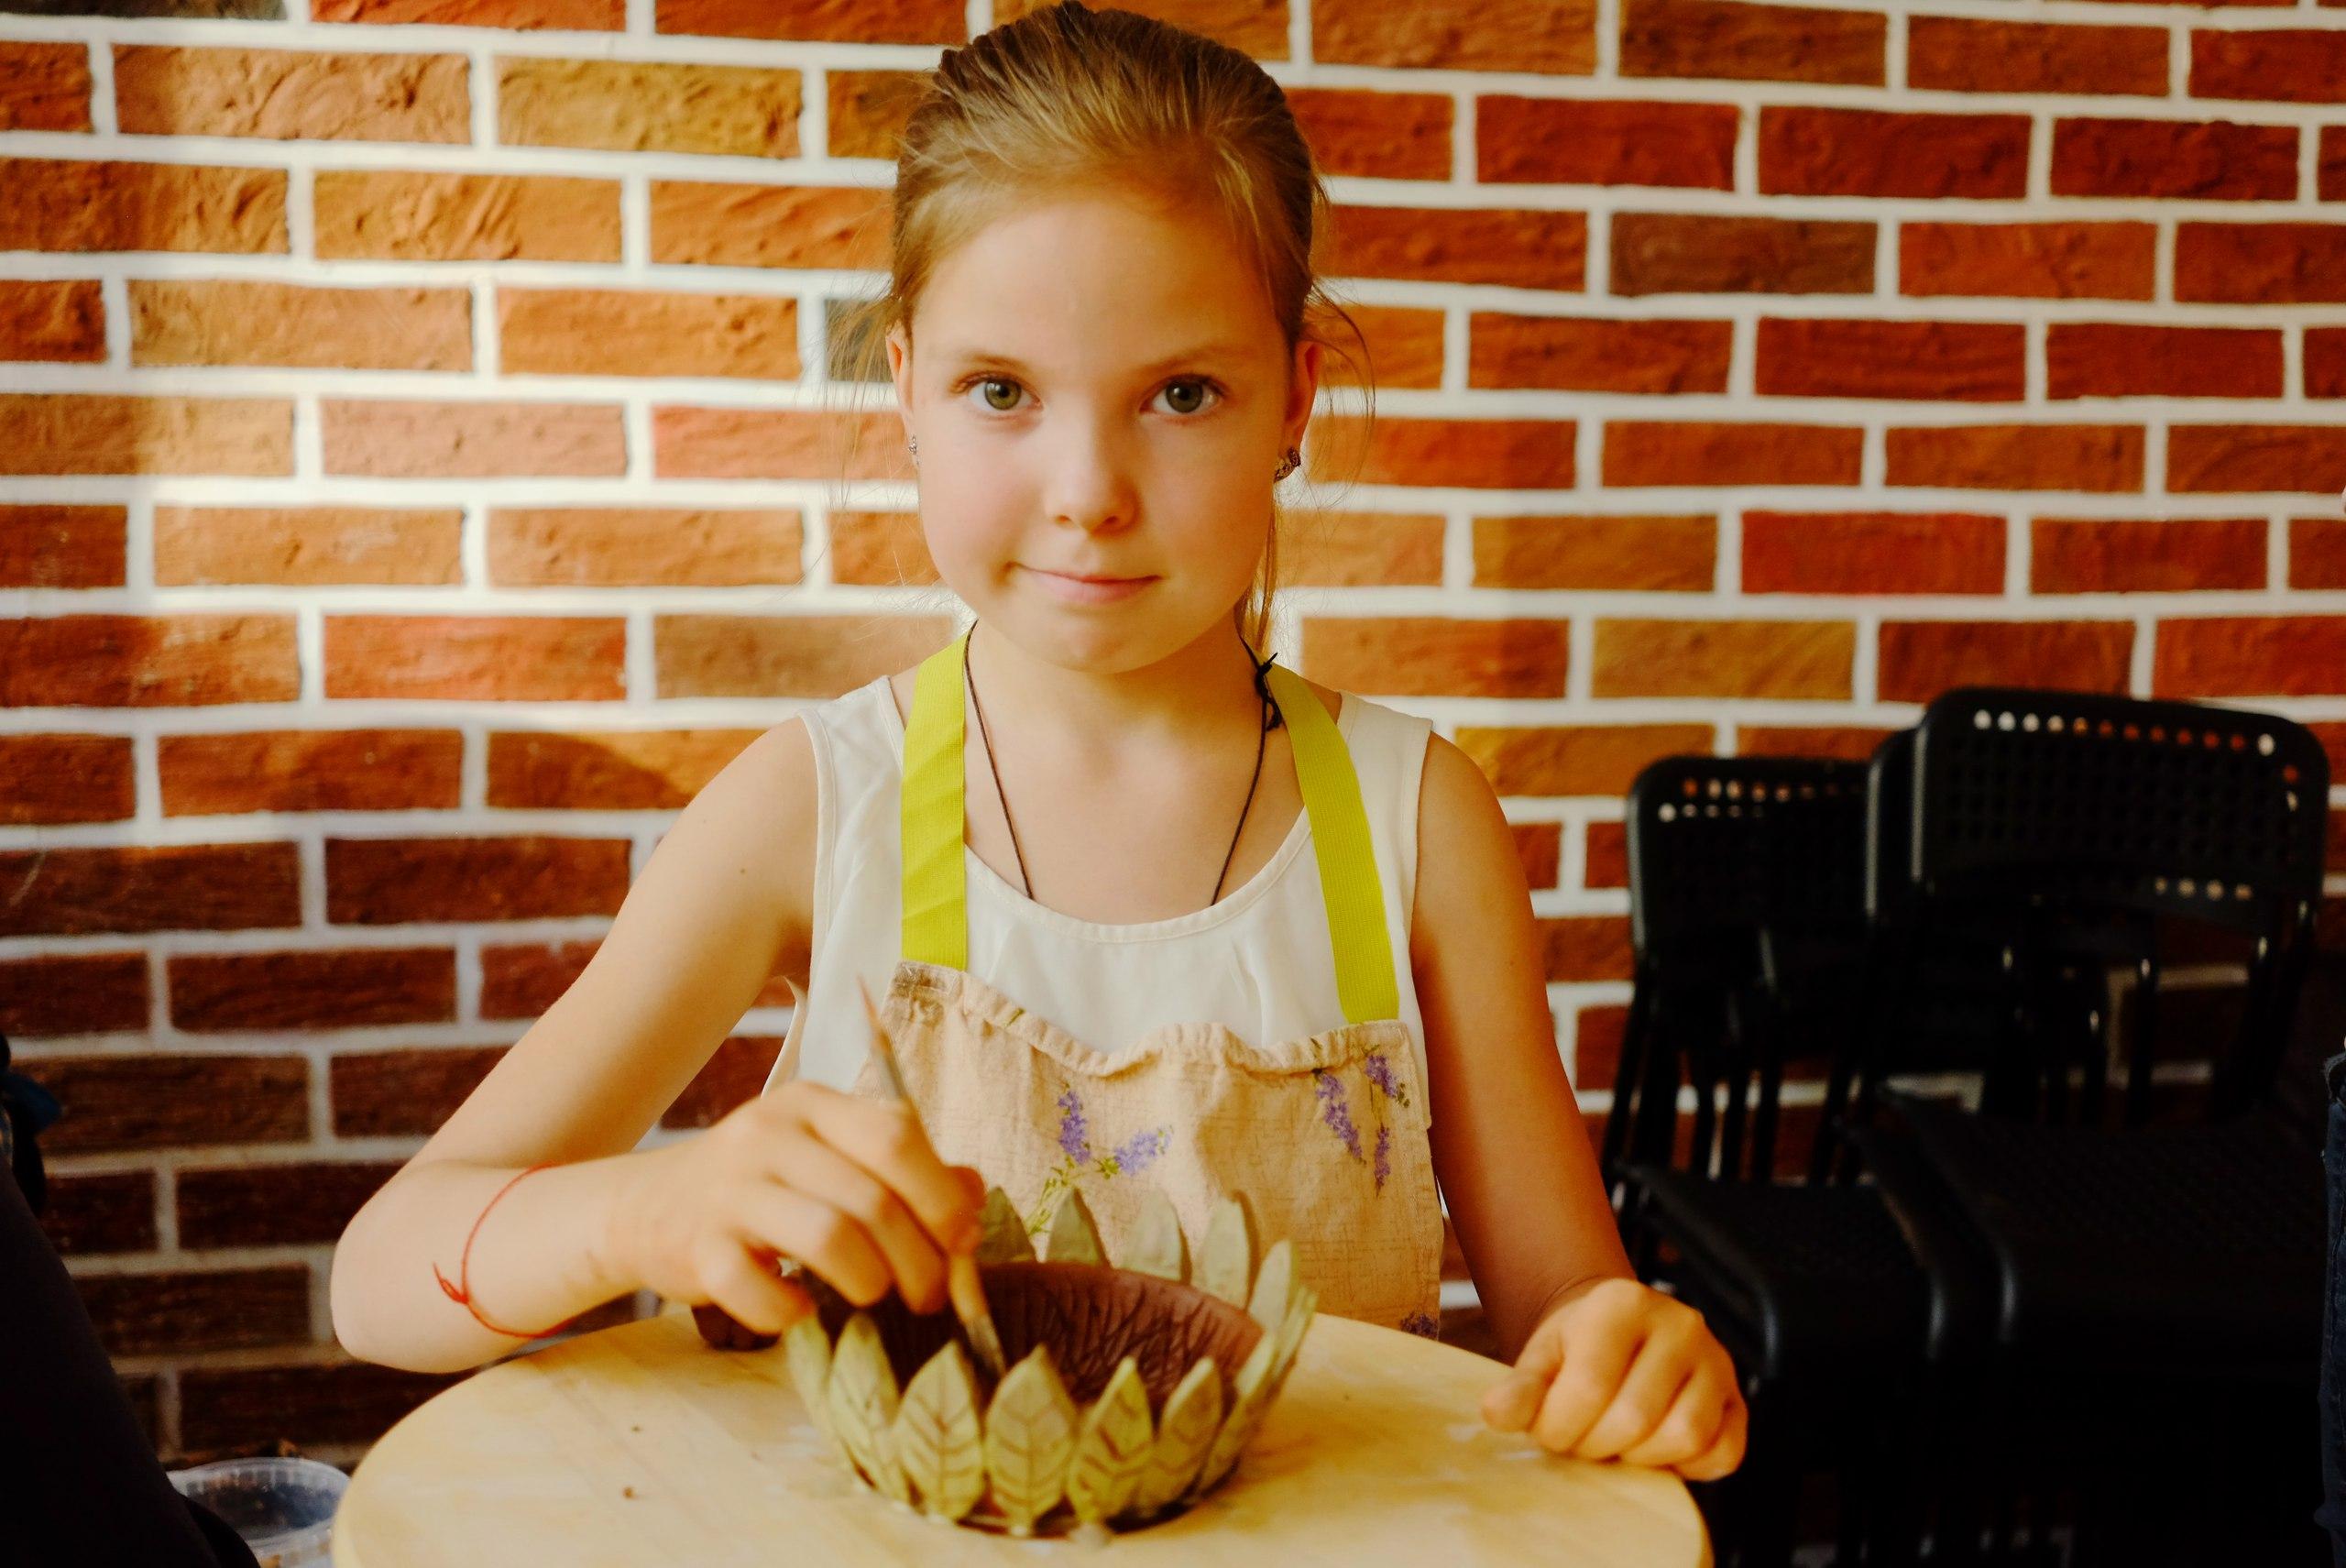 девочка делает тарелку